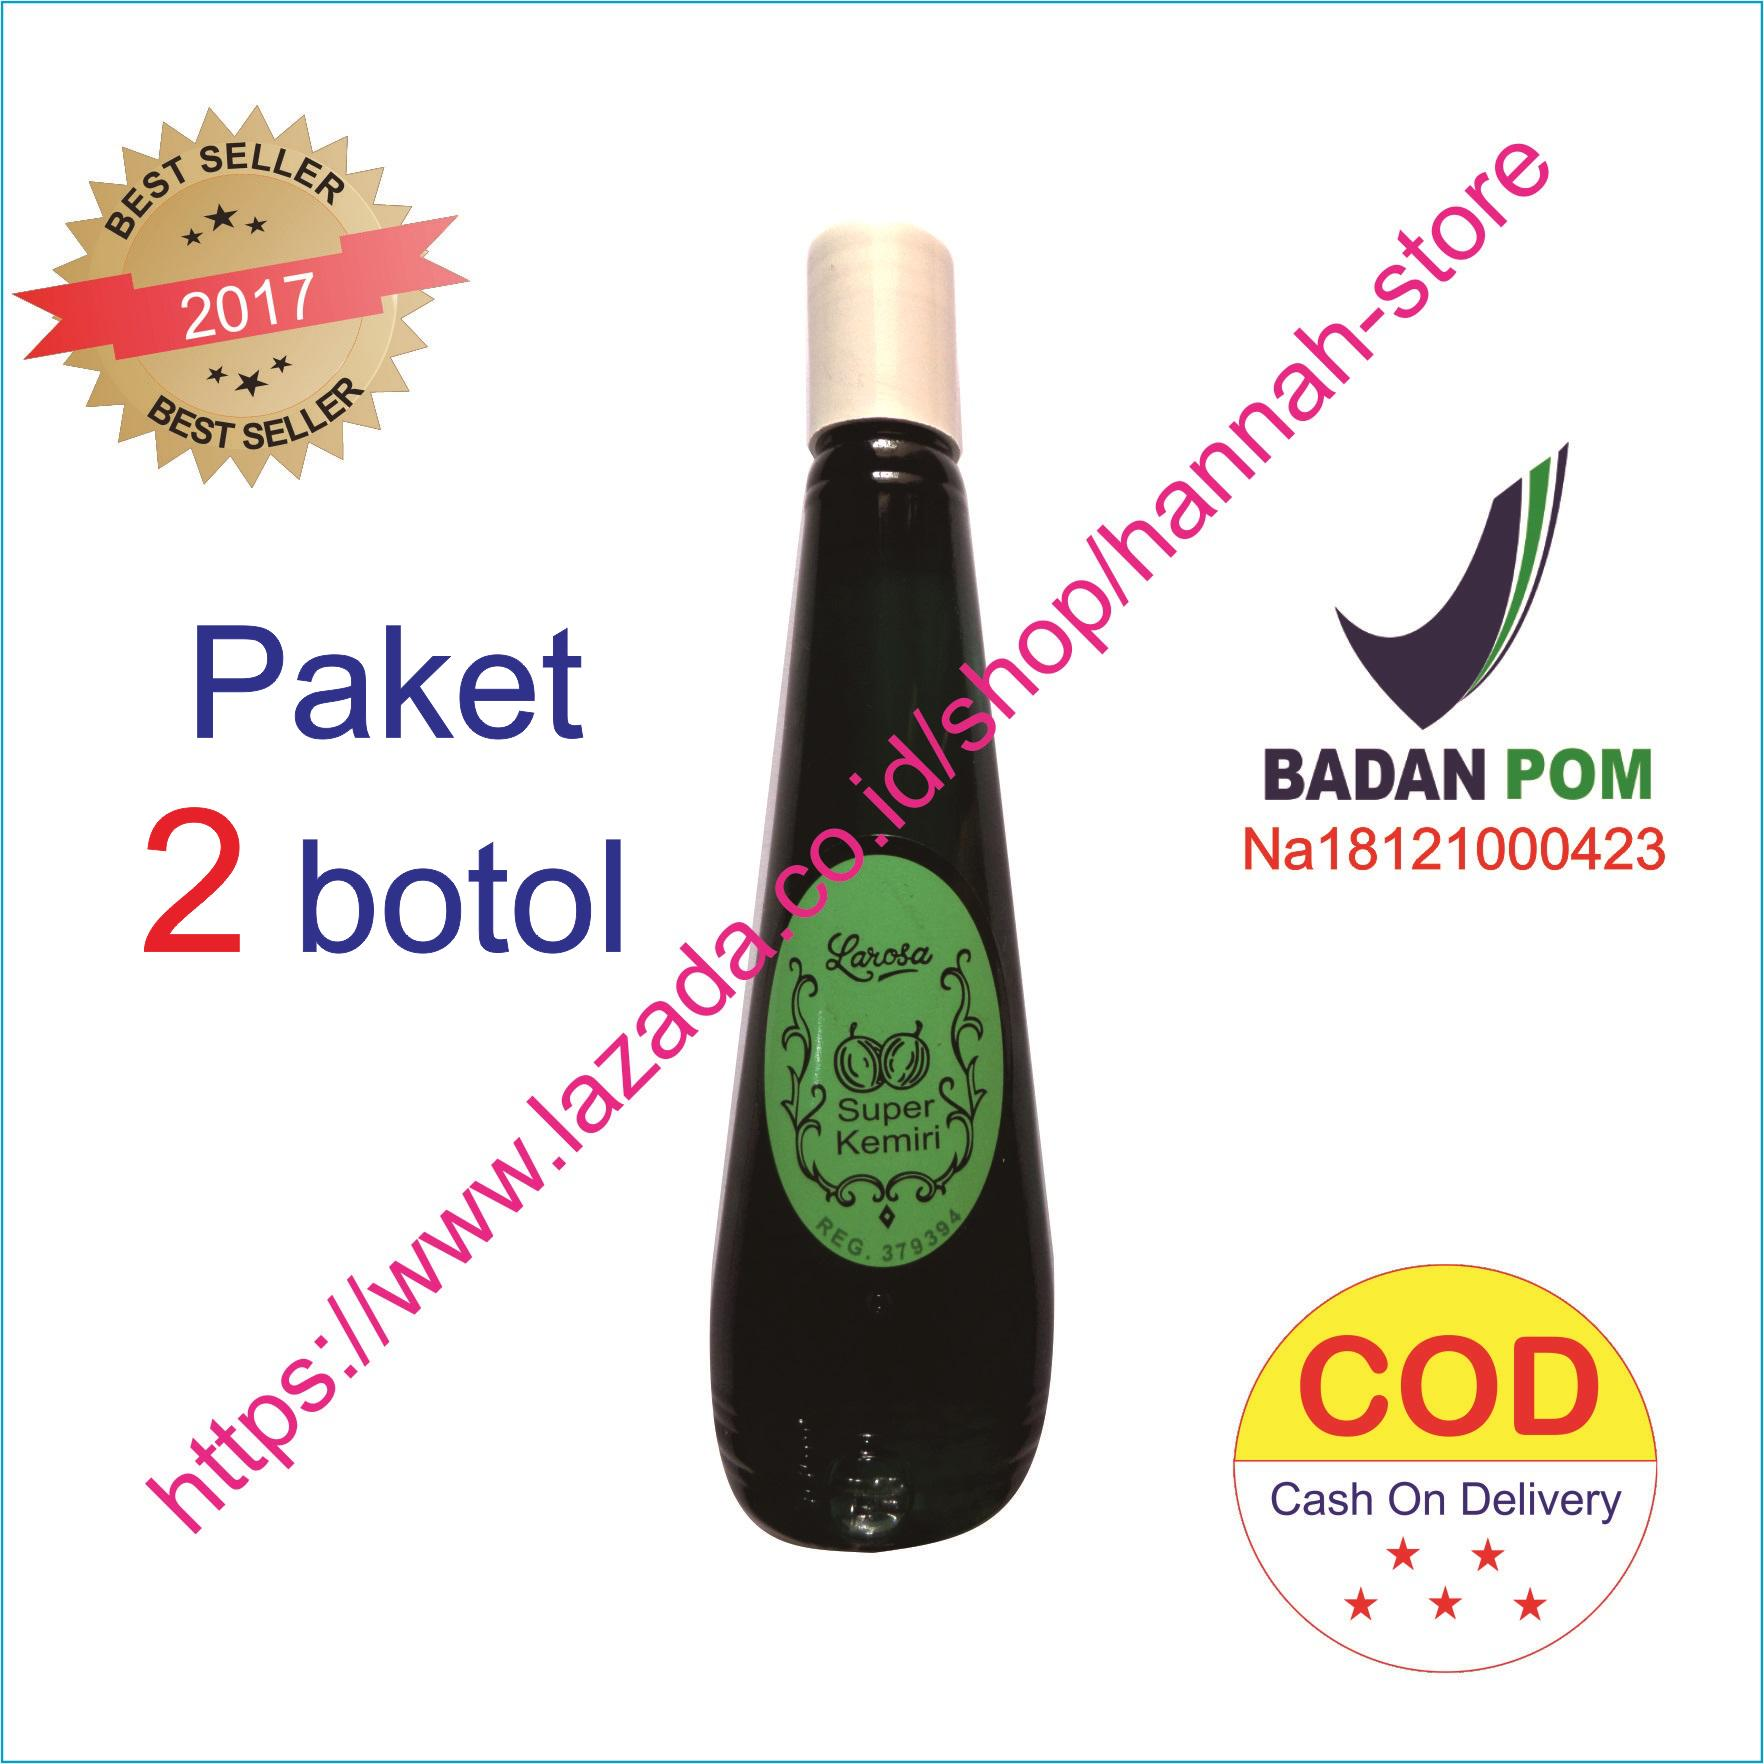 Jual 2 Btl New Murah Garansi Dan Berkualitas Id Store Soffell Botol Spray Kulit Jeruk 80ml X2 Rp 14890